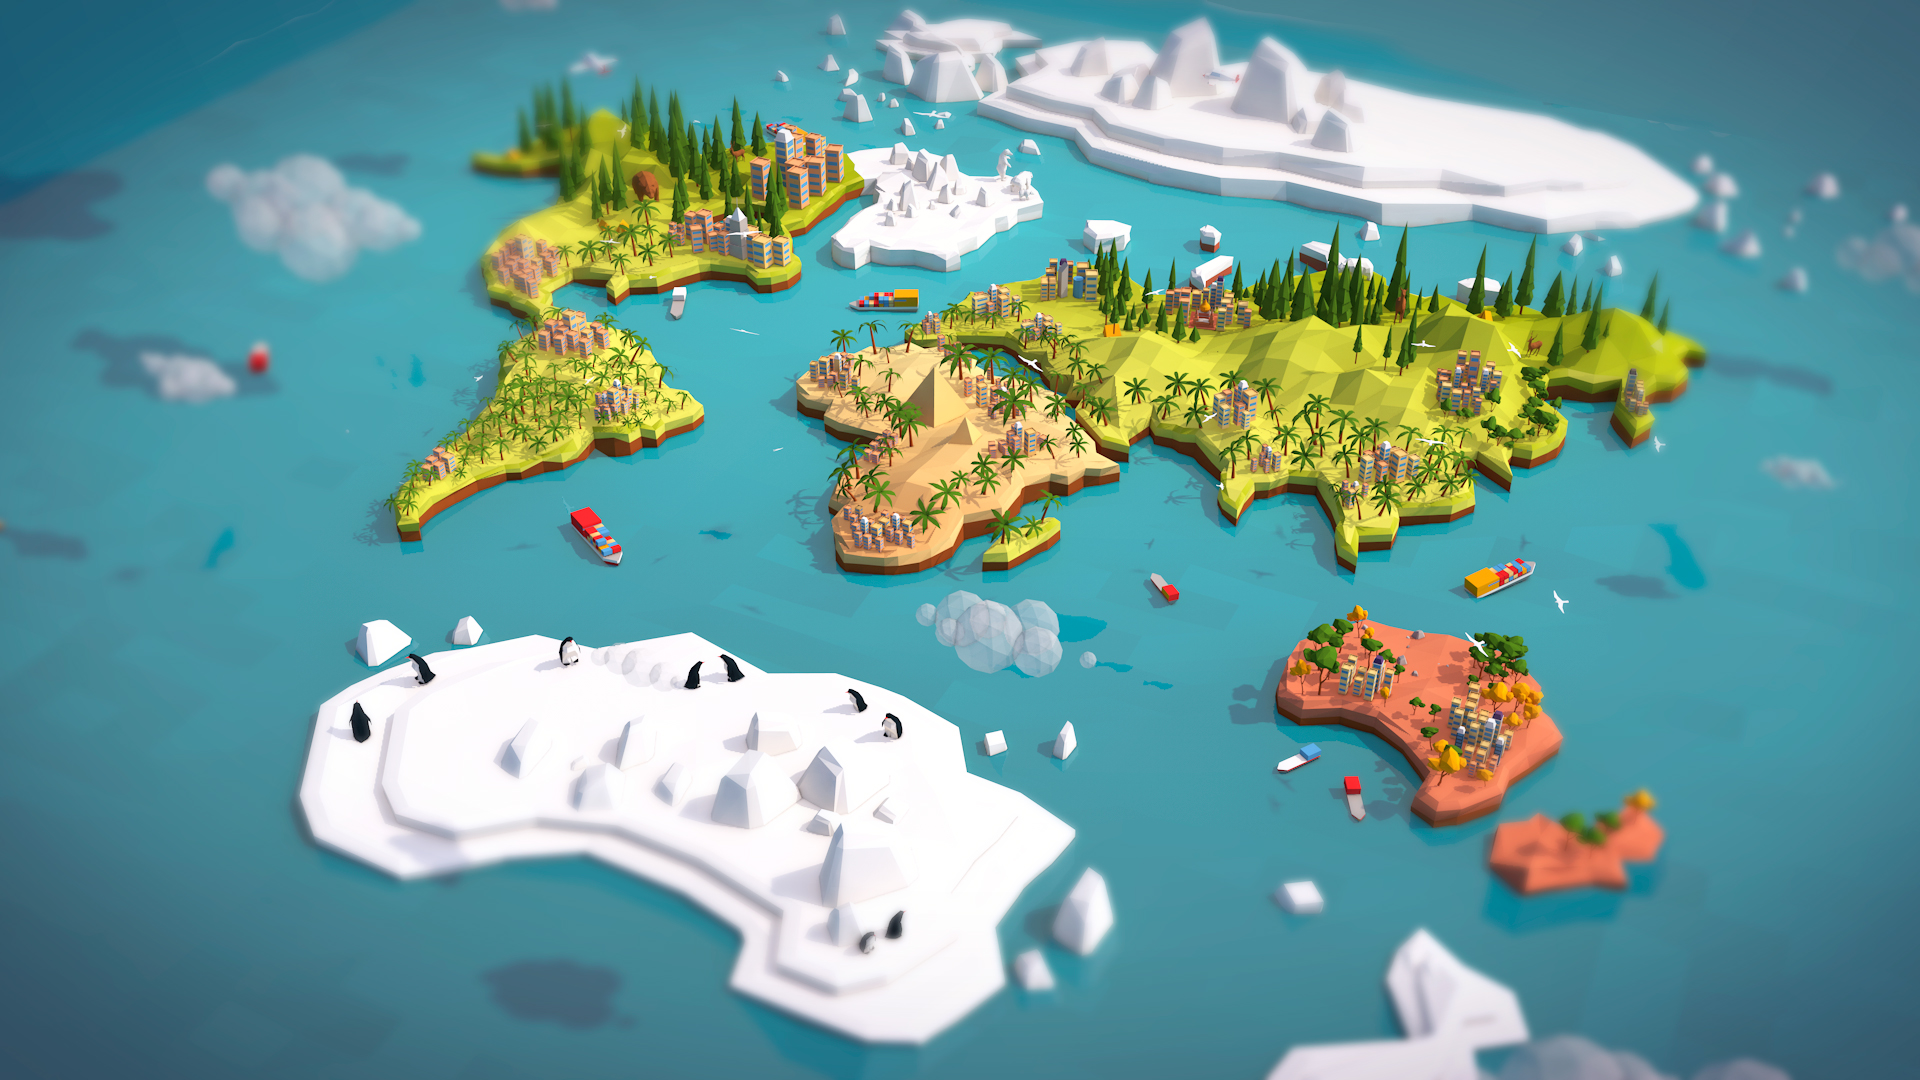 Cartoon Low Poly Earth World Map By Antonmoek 3docean